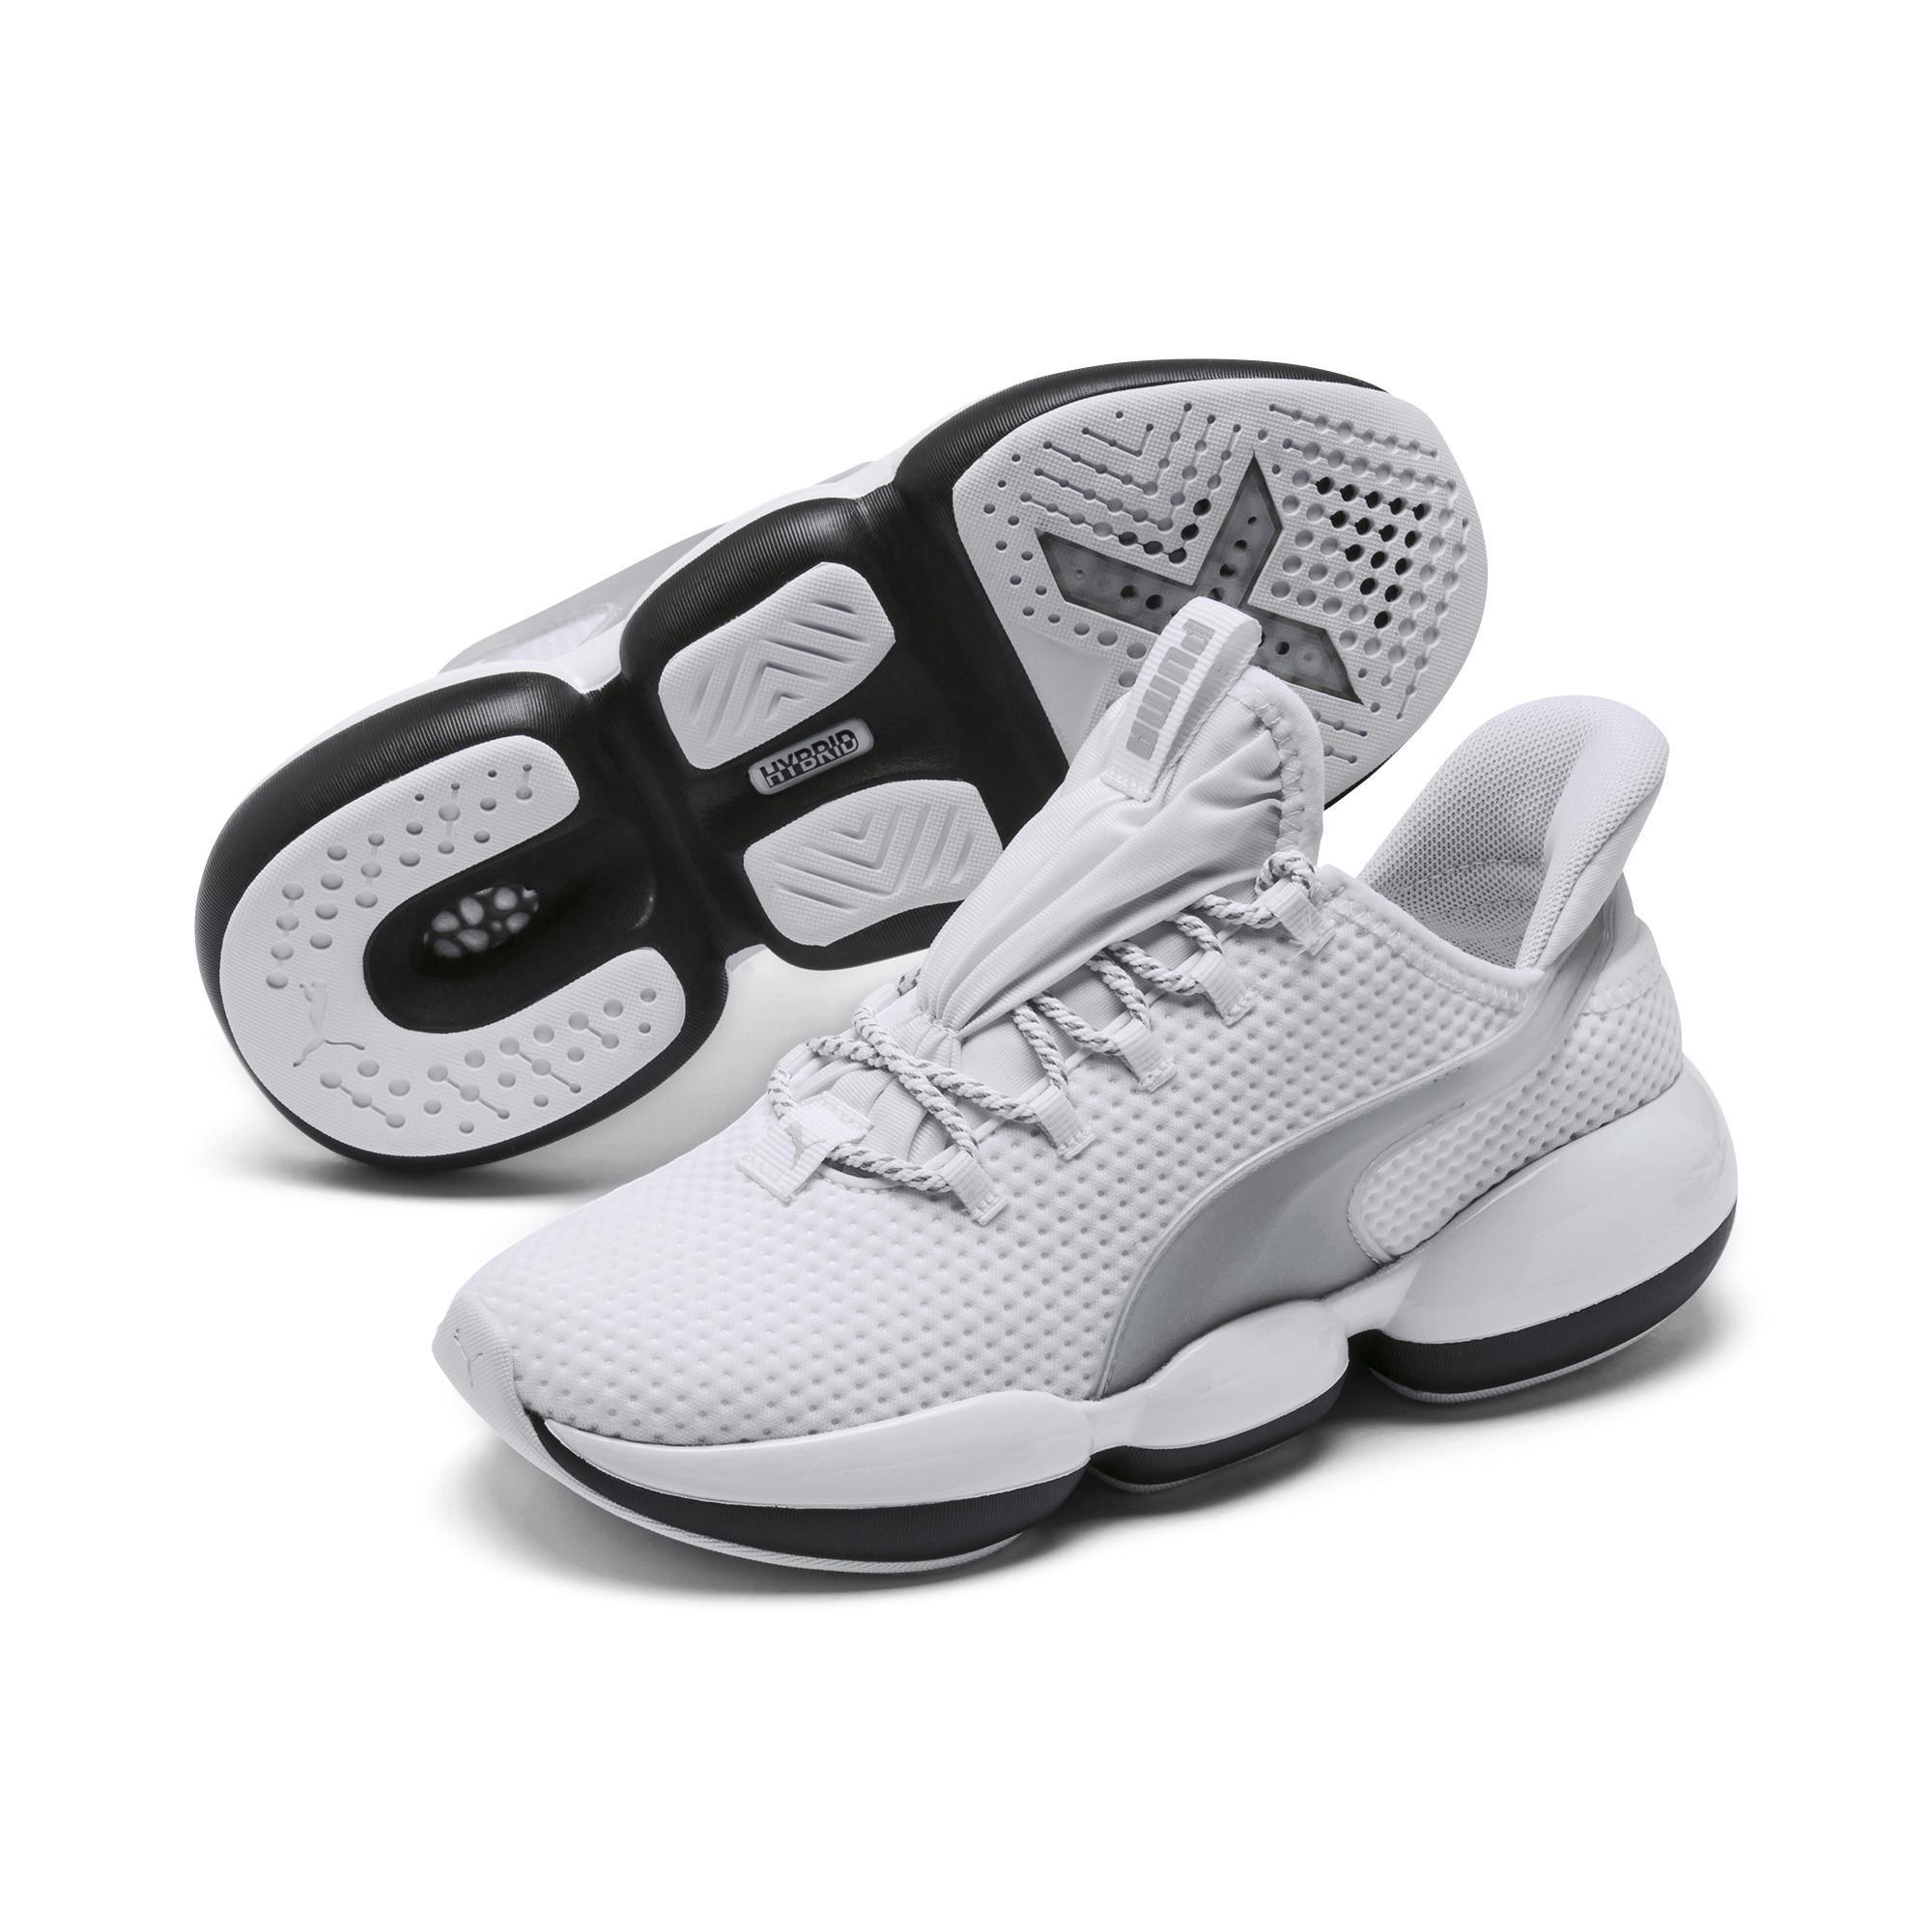 new products f1f4b 48736 PUMA - White Mode Xt Women s Training Shoes - Lyst. View fullscreen